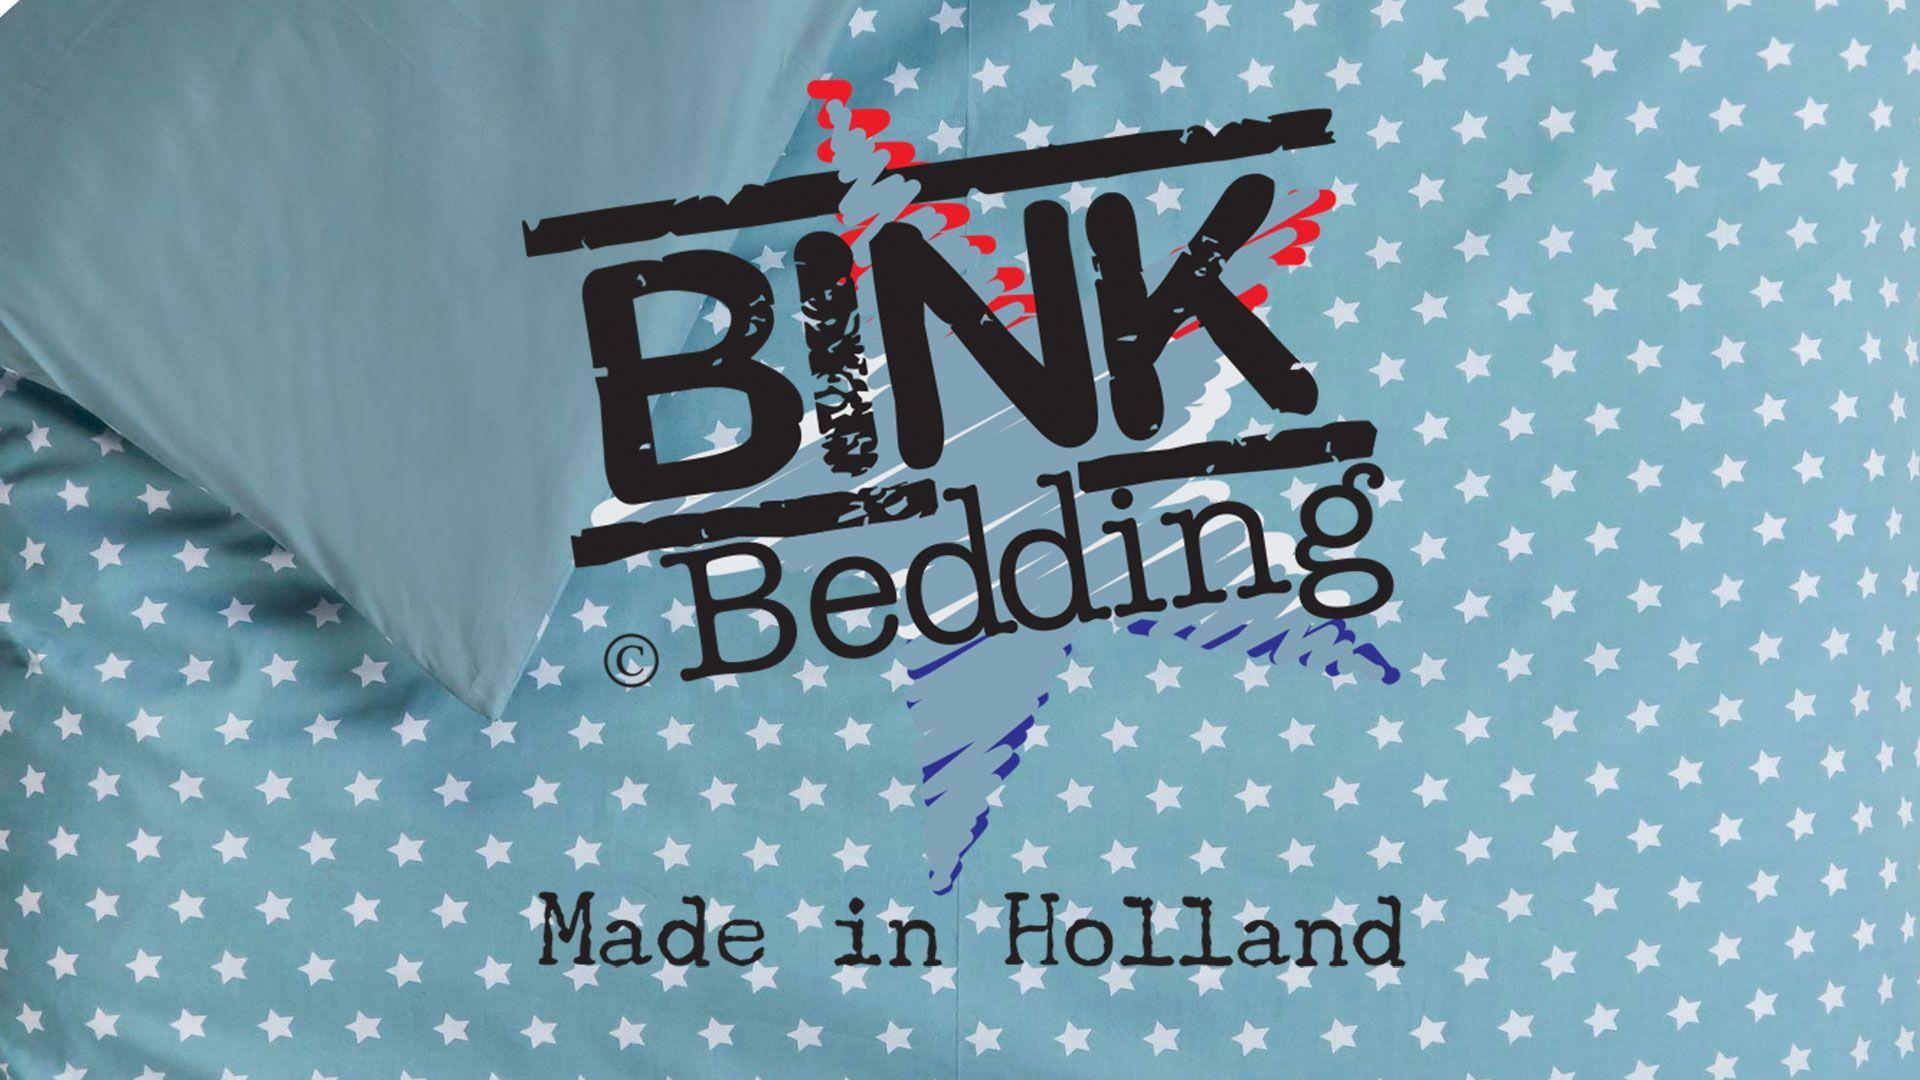 Verrassende Kinderkamer Paarden : Artikelen over kinderkamer smulderstextiel.nl blog